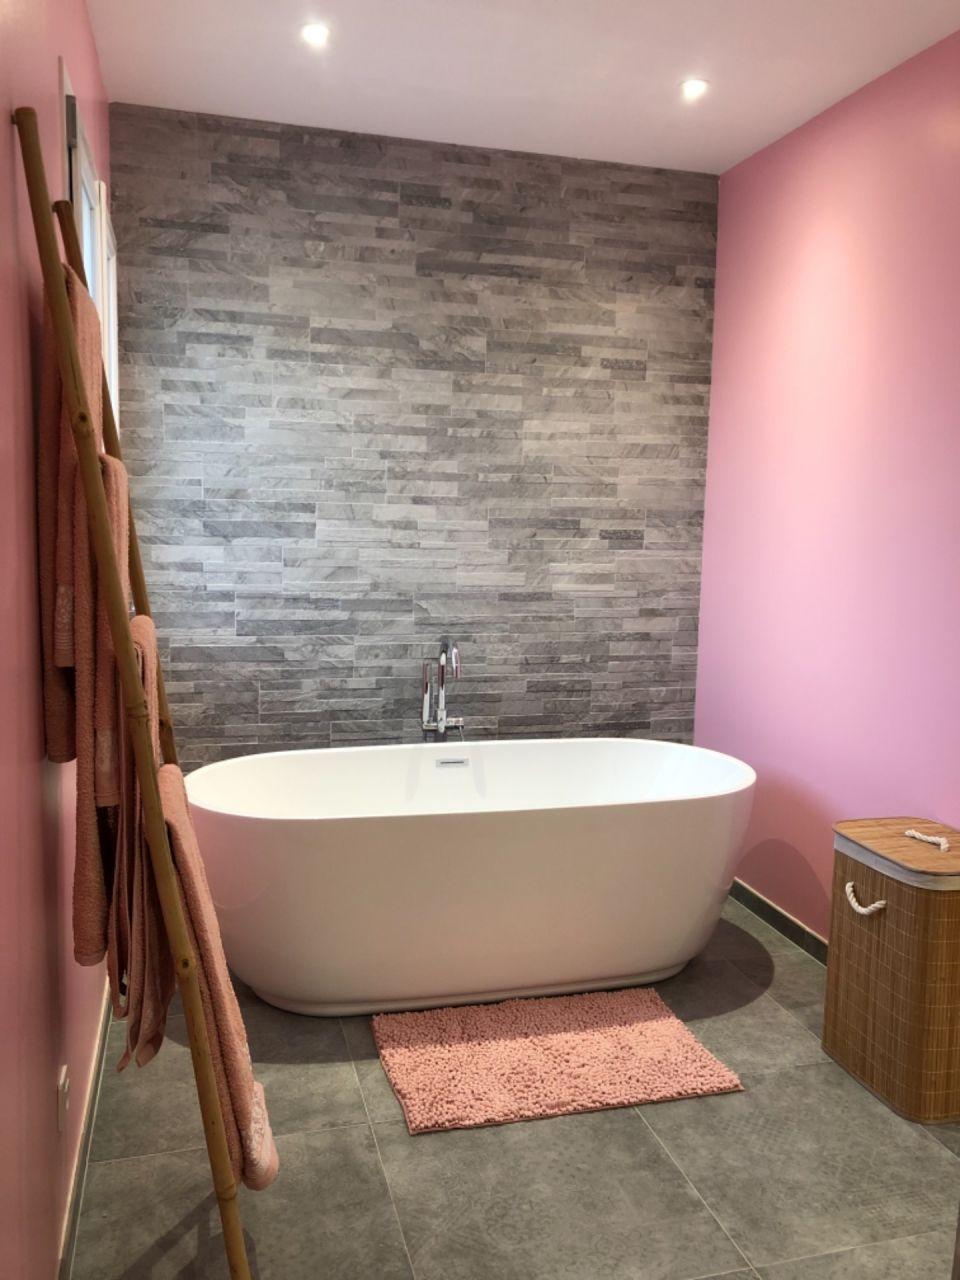 Salle de bain de l'étage enfin terminée